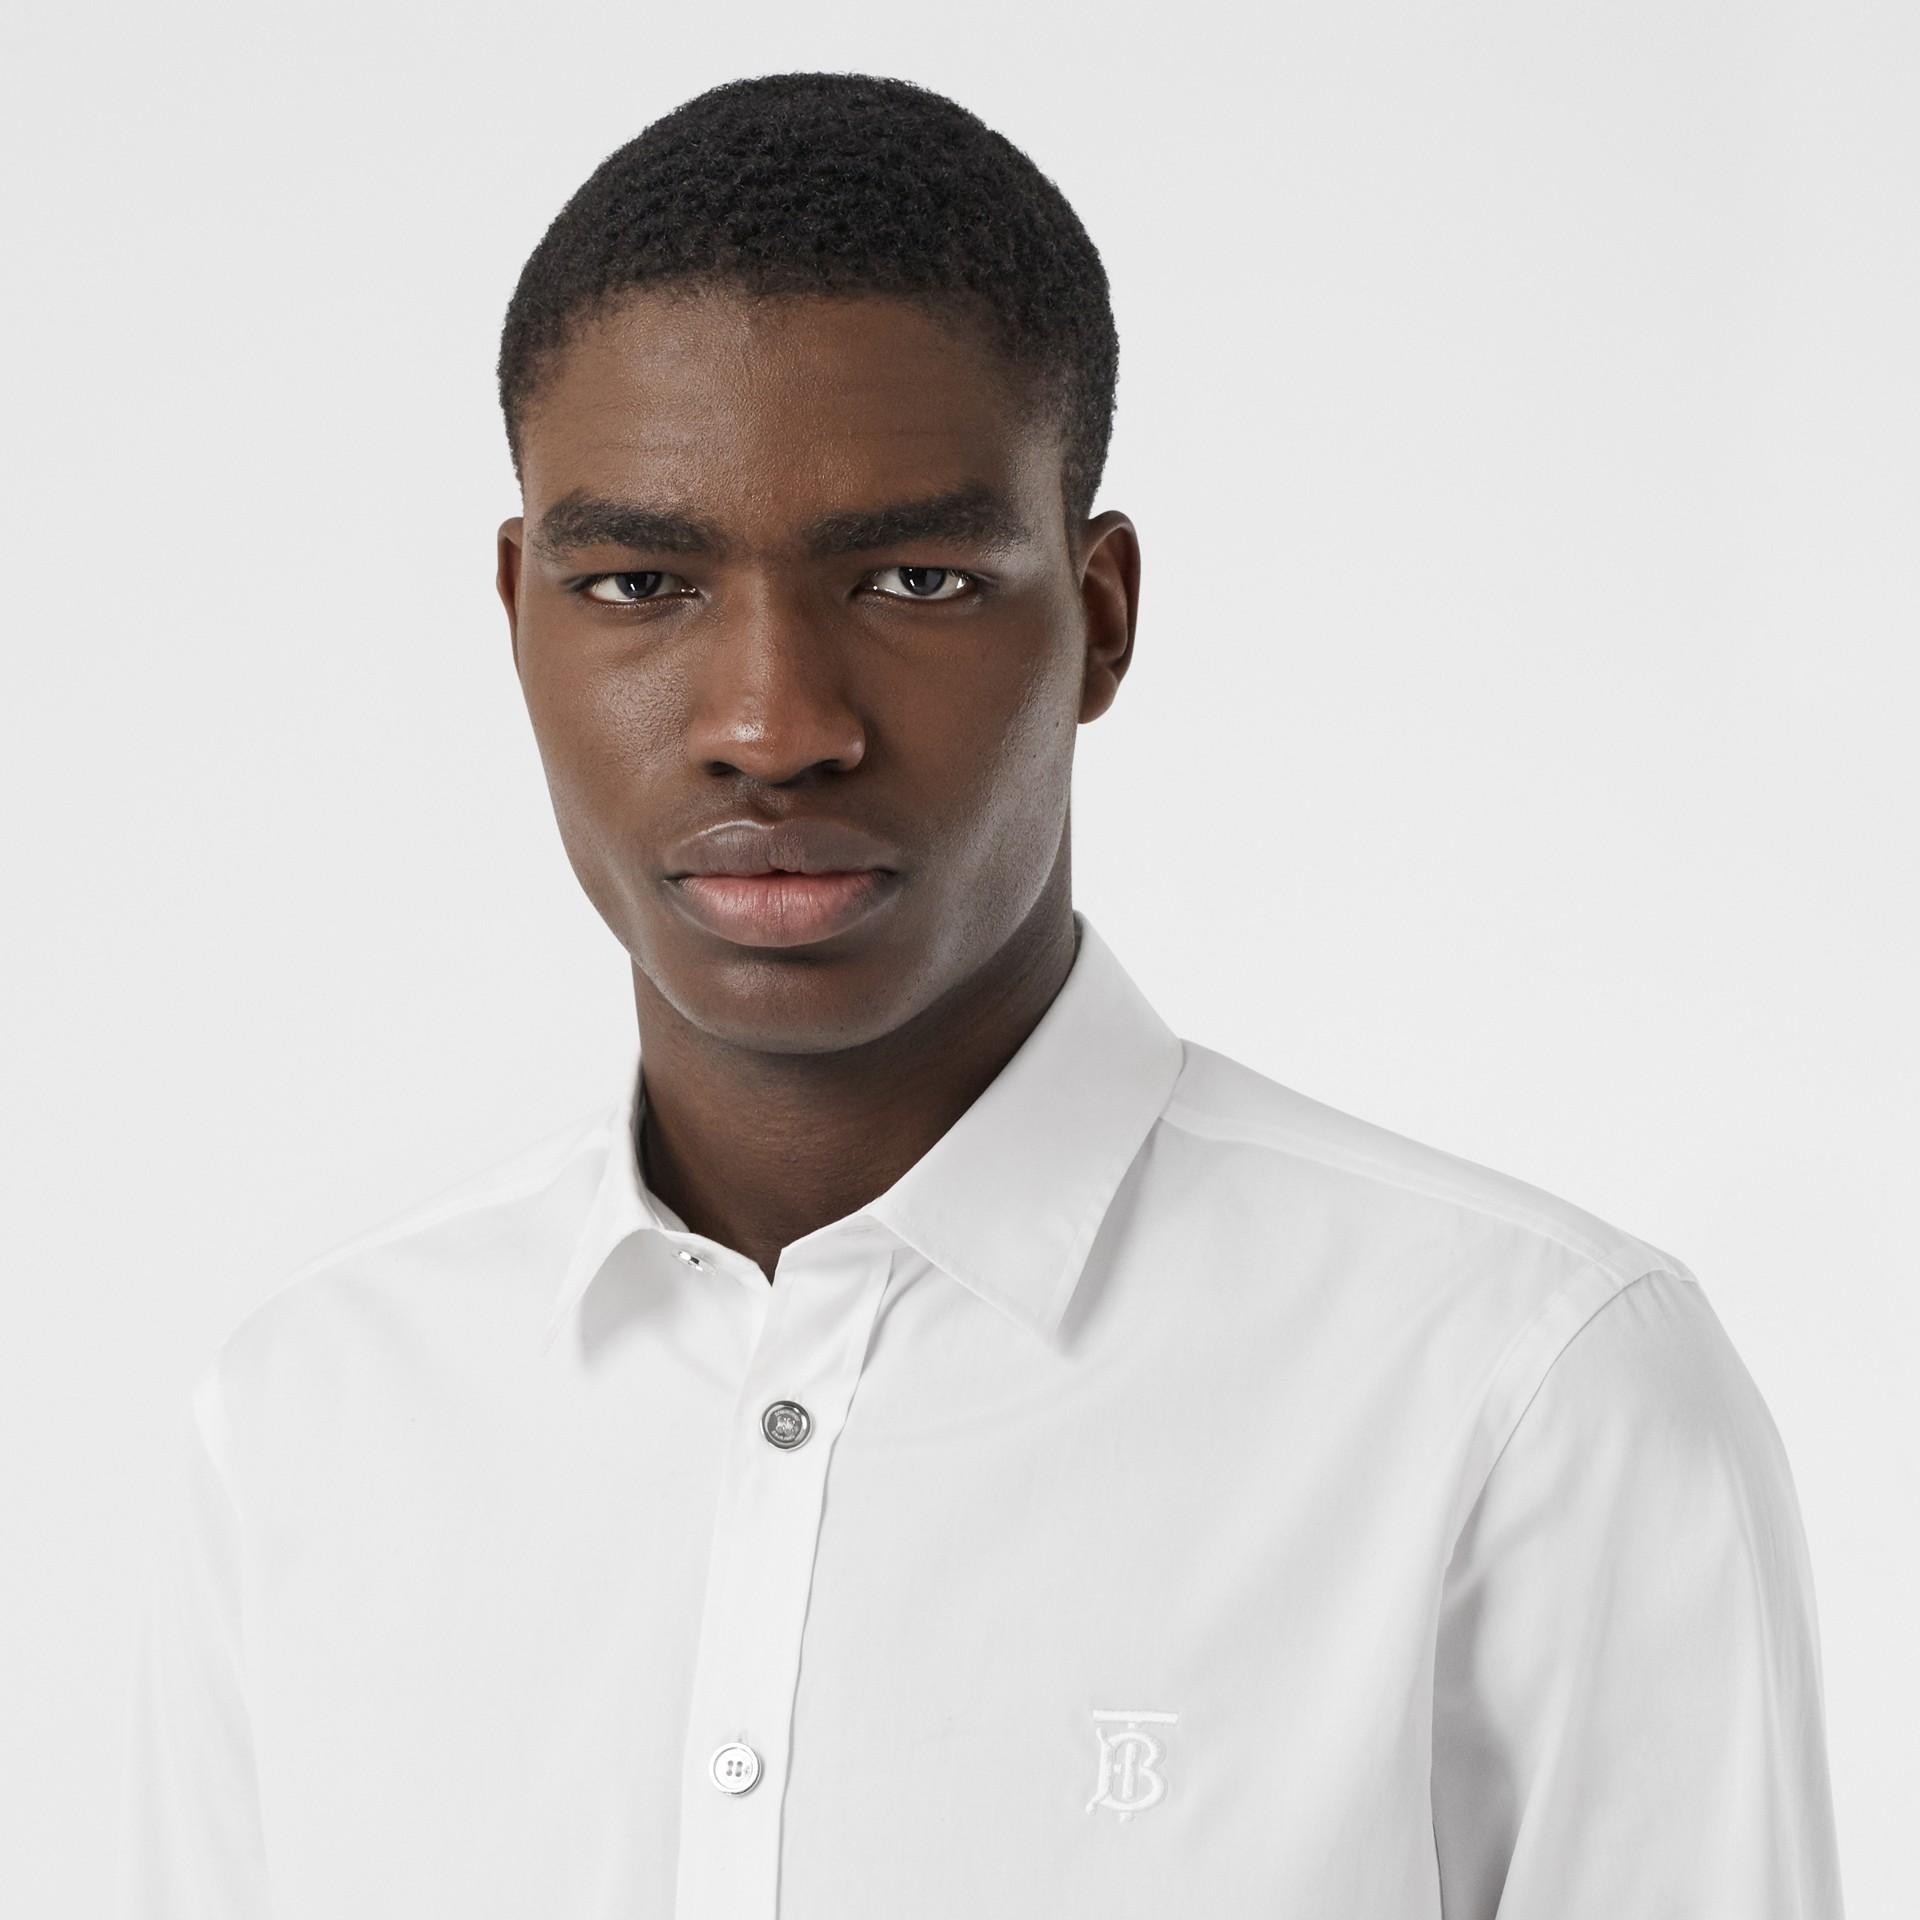 Monogram Motif Stretch Cotton Poplin Shirt in White - Men | Burberry United Kingdom - gallery image 1